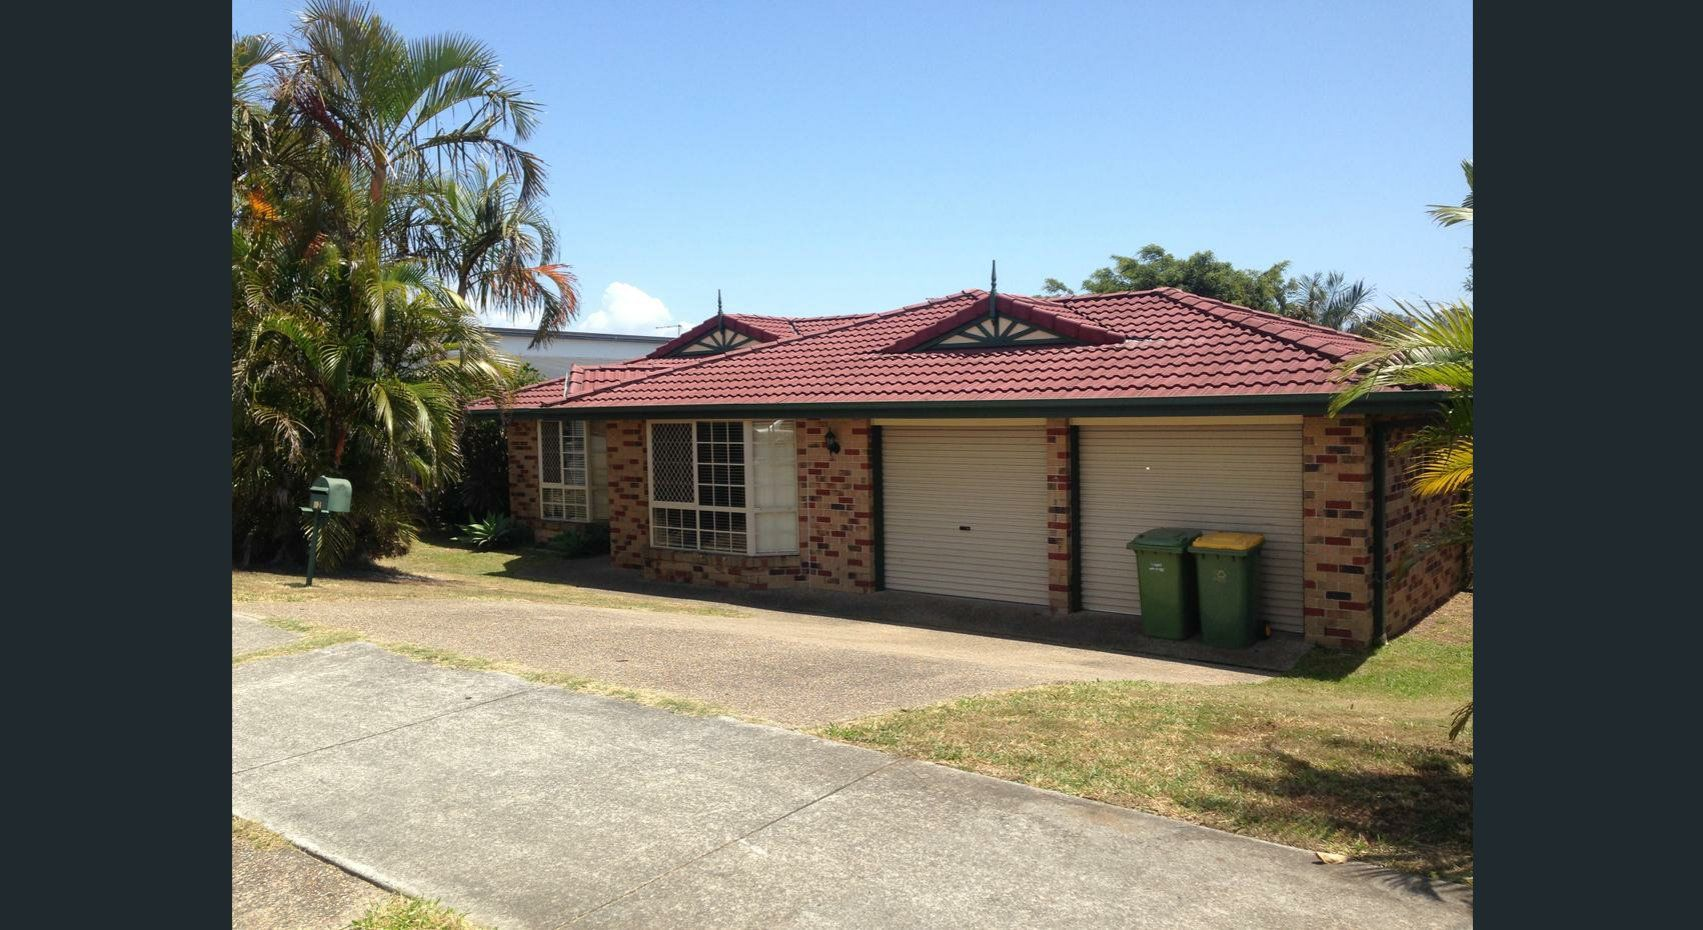 62 Bailey Road, Birkdale QLD 4159, Image 0